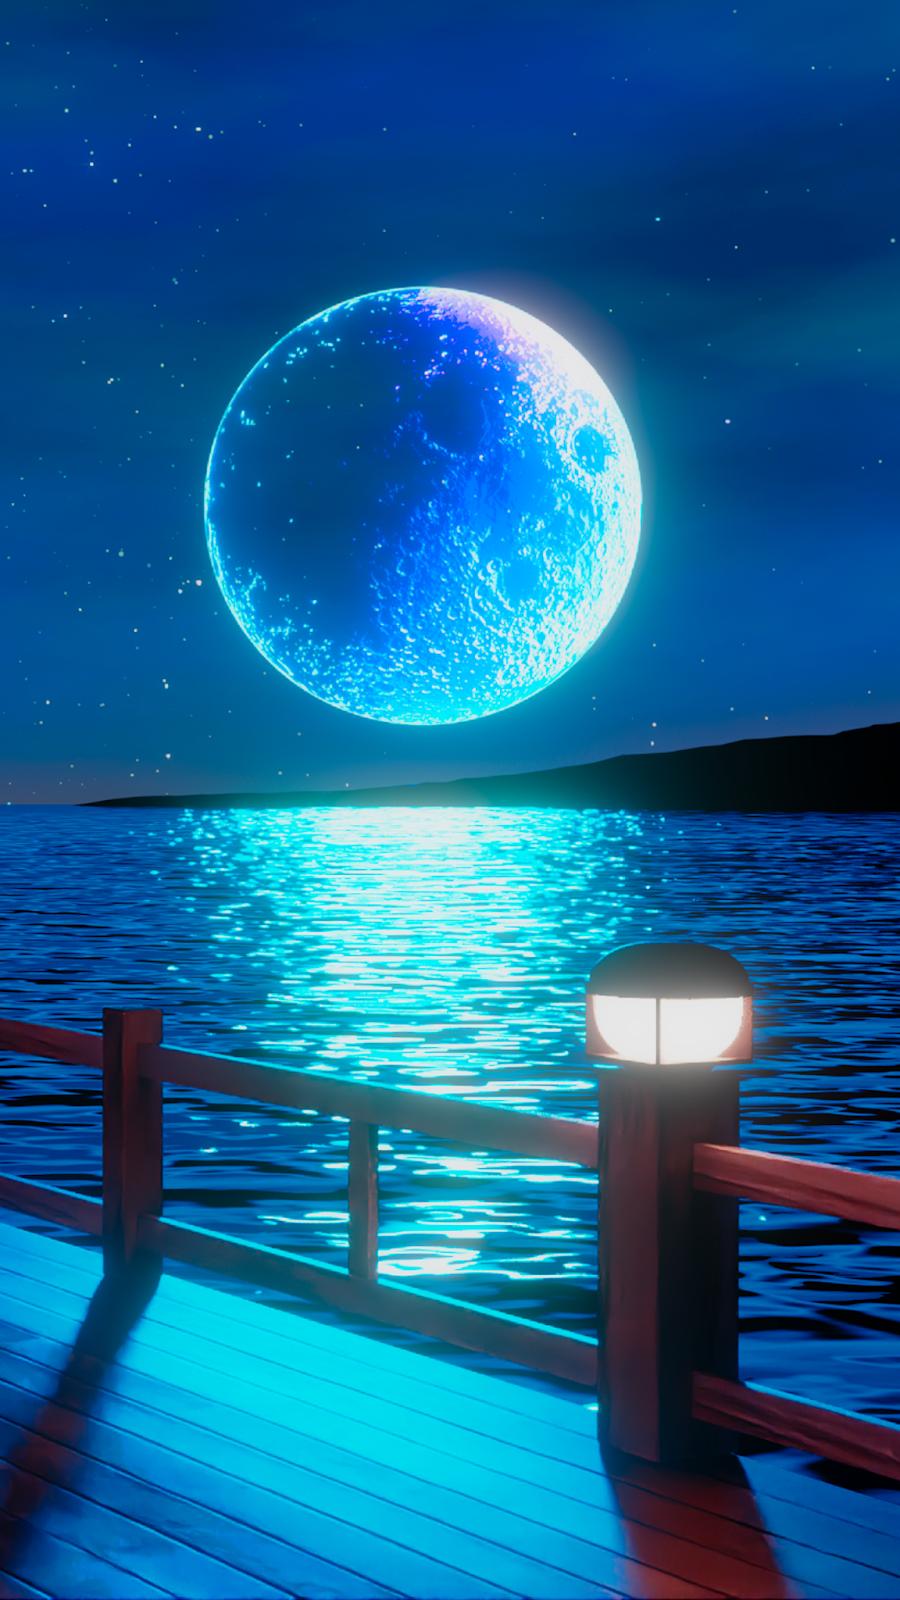 Full Moon Of The Night In 2020 Iphone Wallpaper Sky Beautiful Wallpapers Scenery Wallpaper